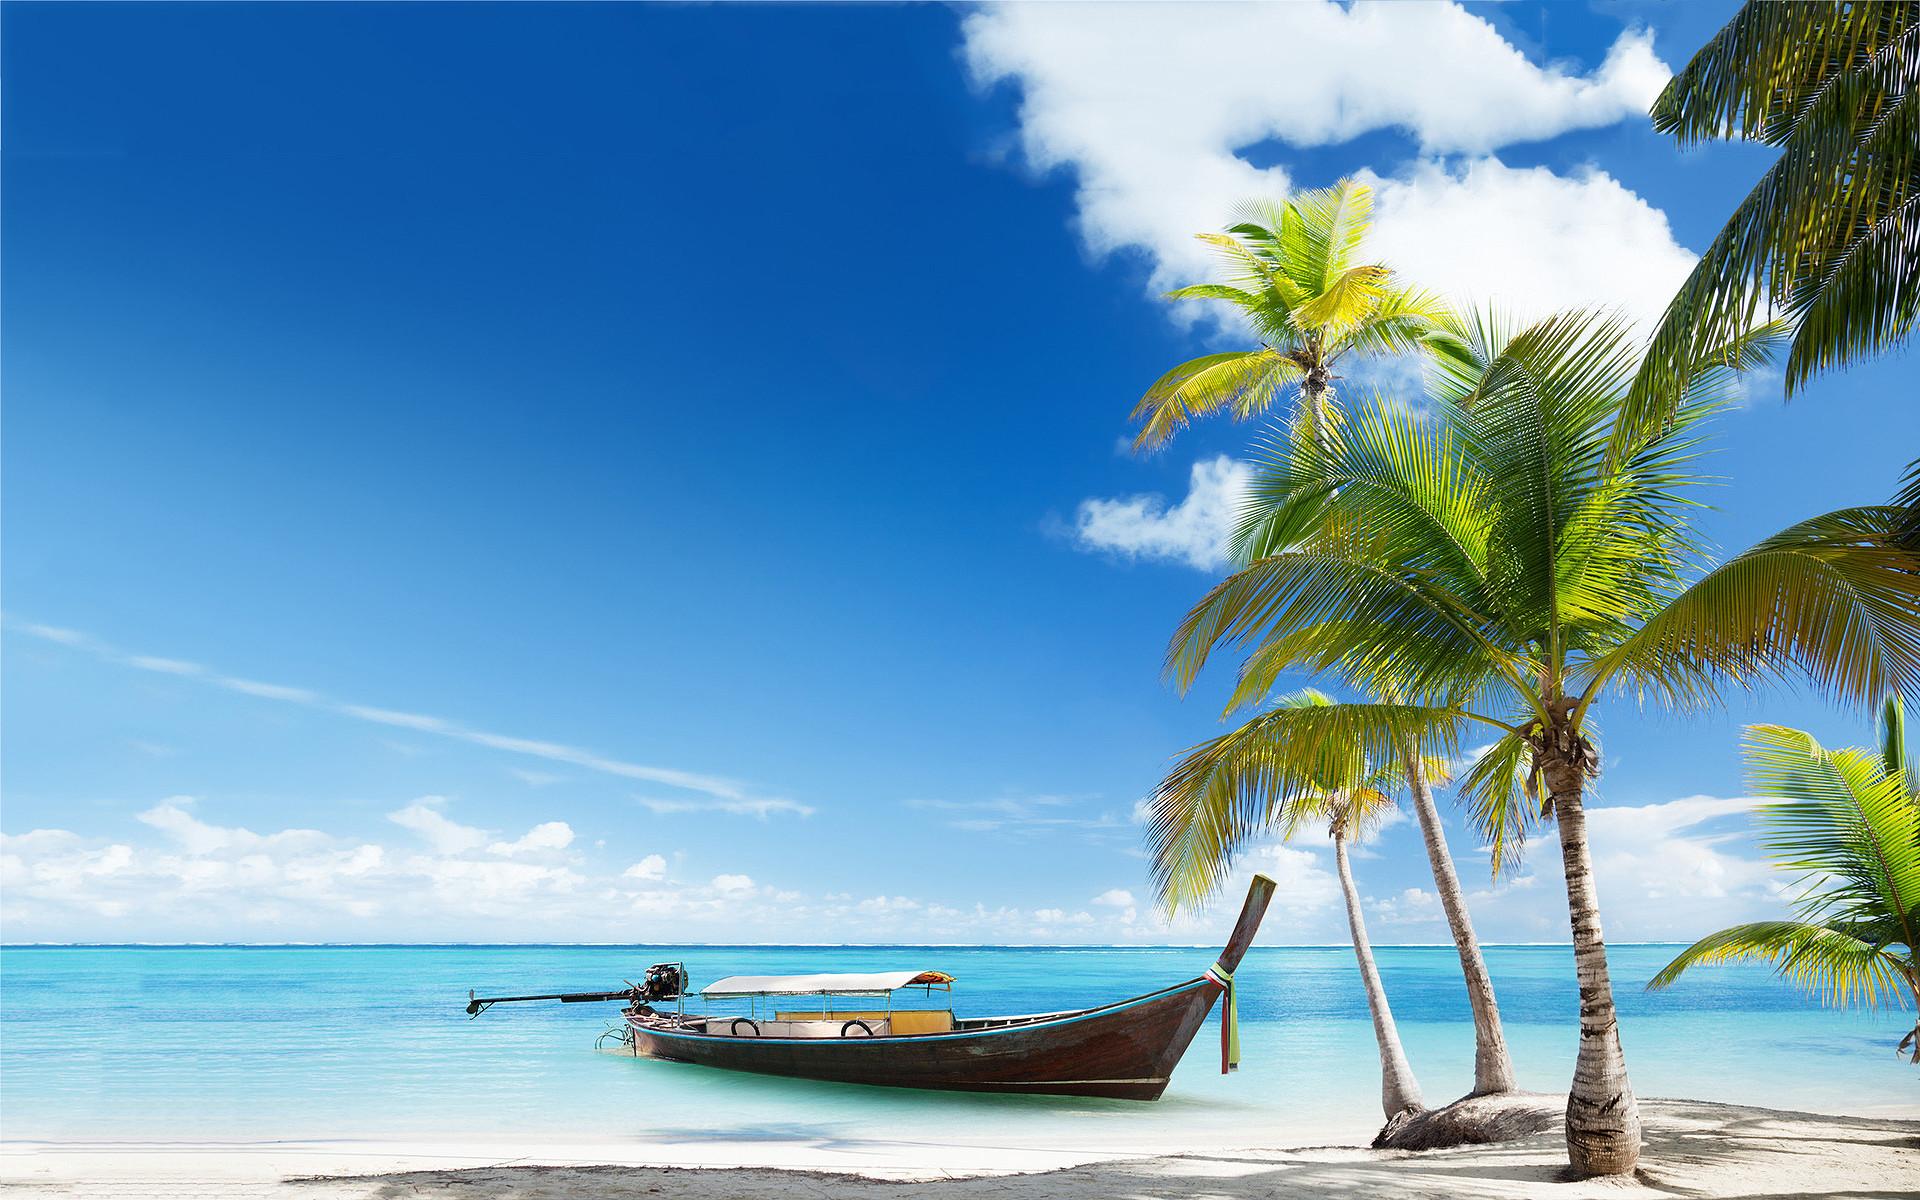 Sunset Beach HD Wallpapers. Tropical Beach Free Download